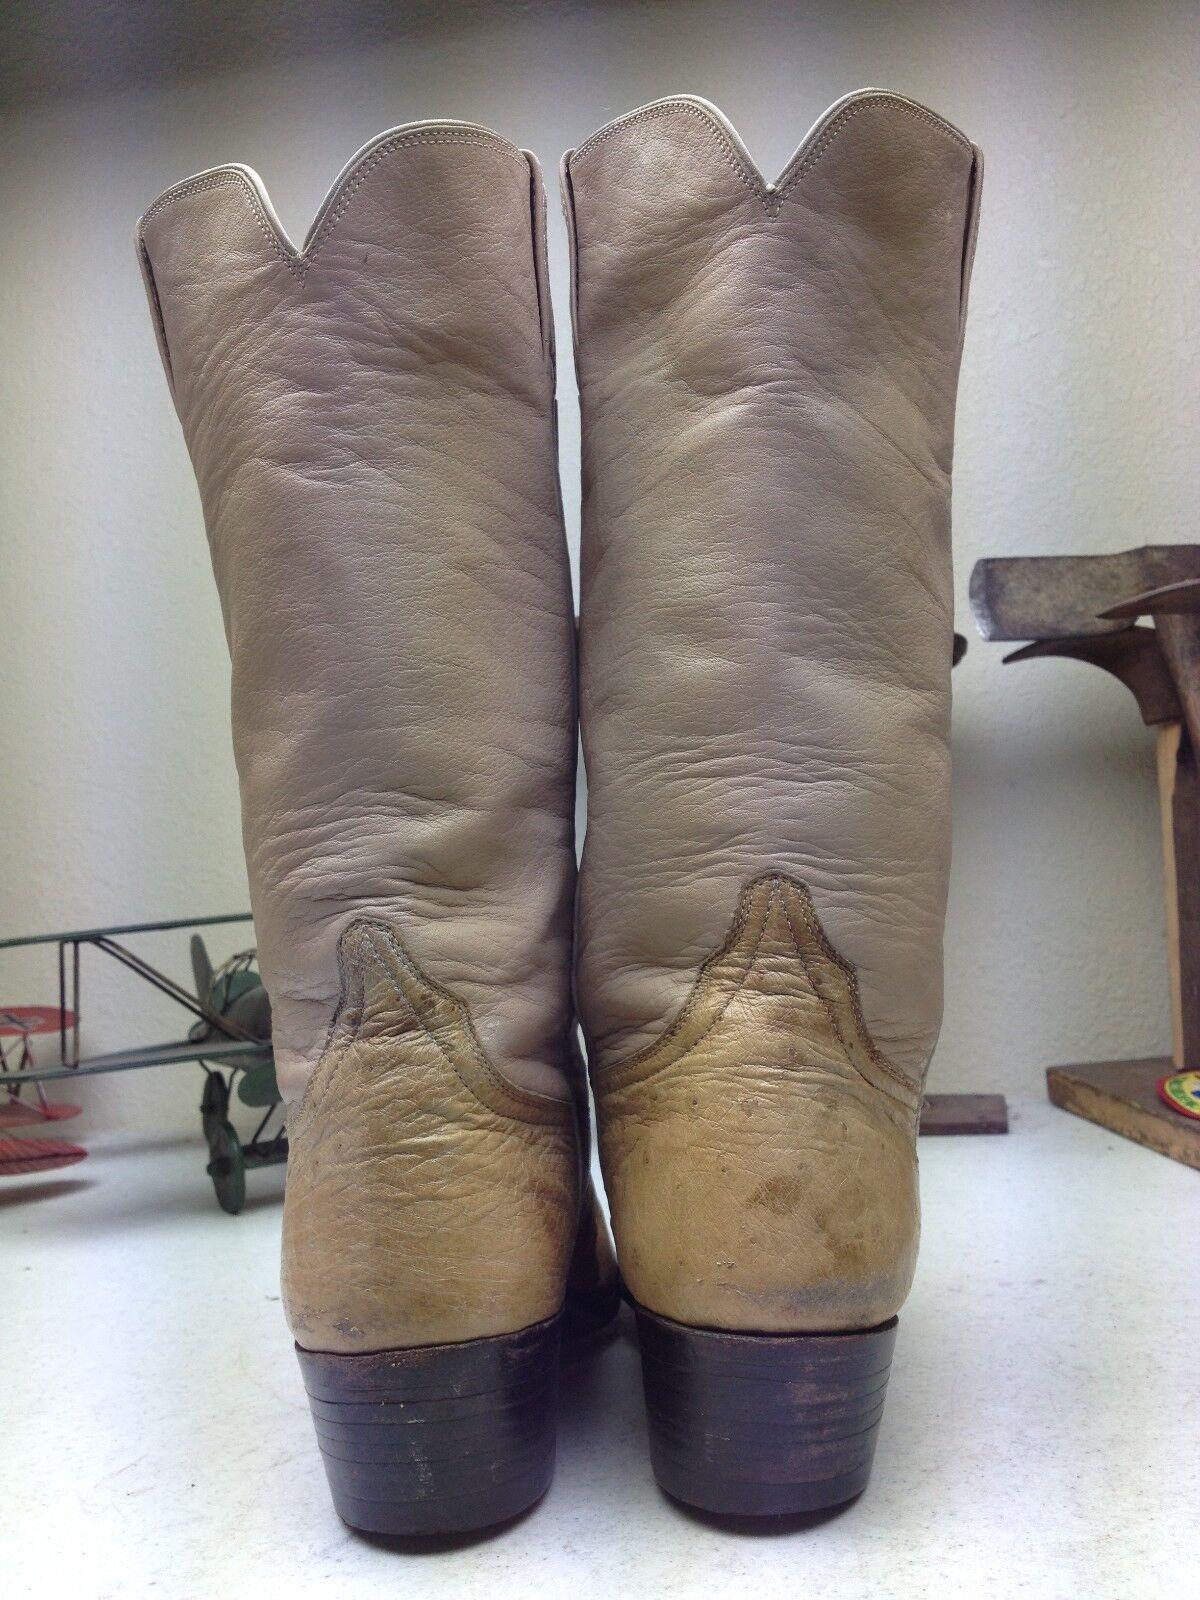 DISTRESSED CAMARGO BOOT CUSTOM HAND MADE PINK BUTTER OSTRICH COWBOY DANCE BOOT CAMARGO 6-6.5B 3eb032